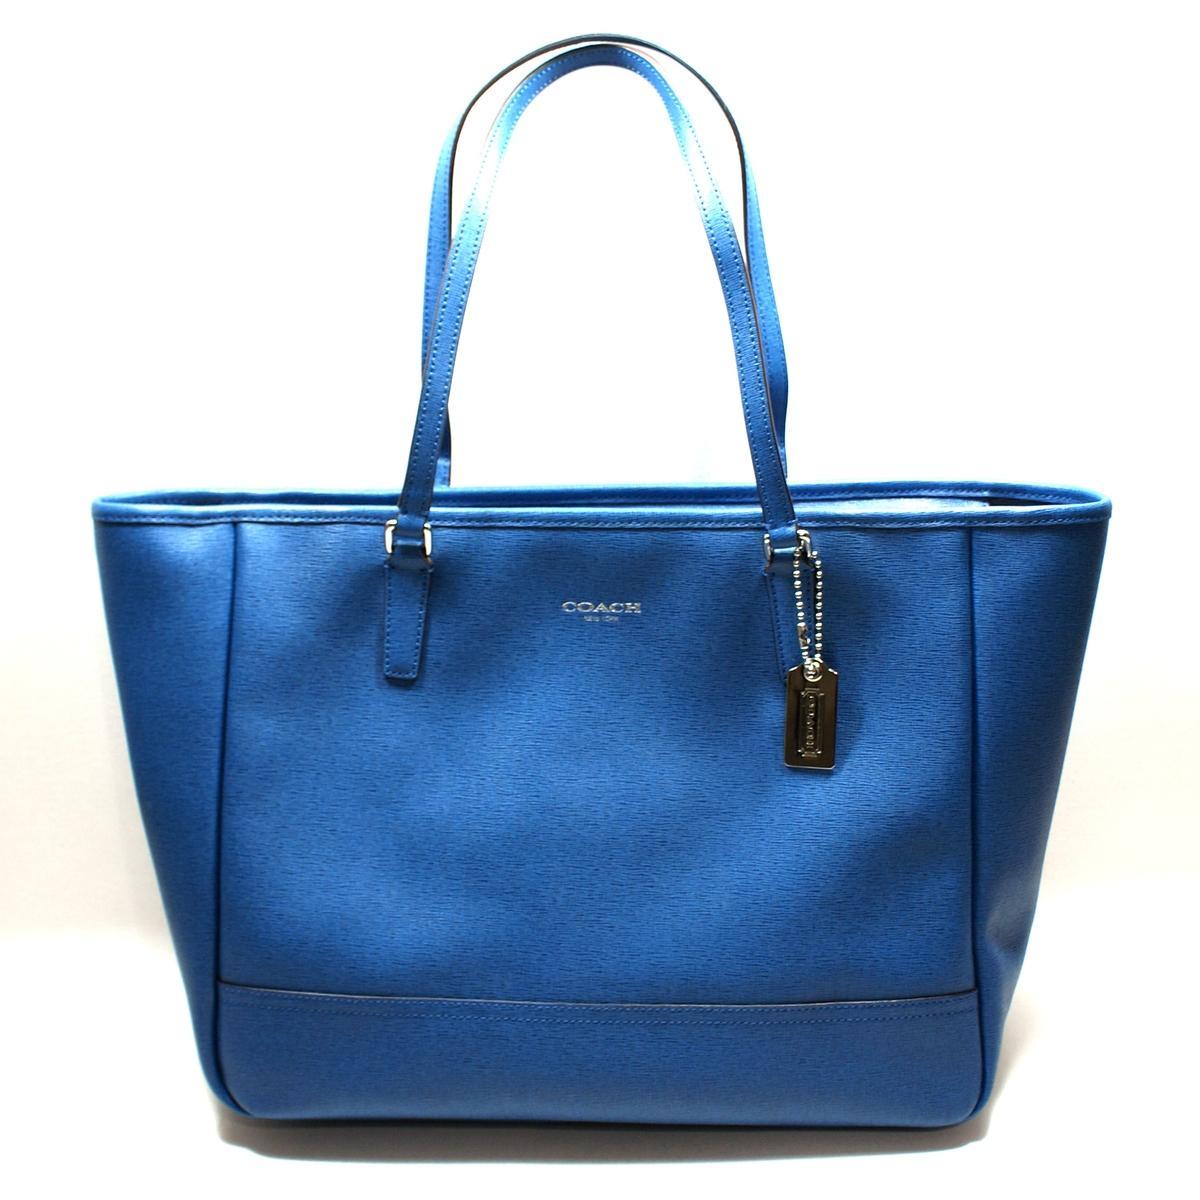 Coach Saffiano Leather Medium East West Tote Bag Cobalt